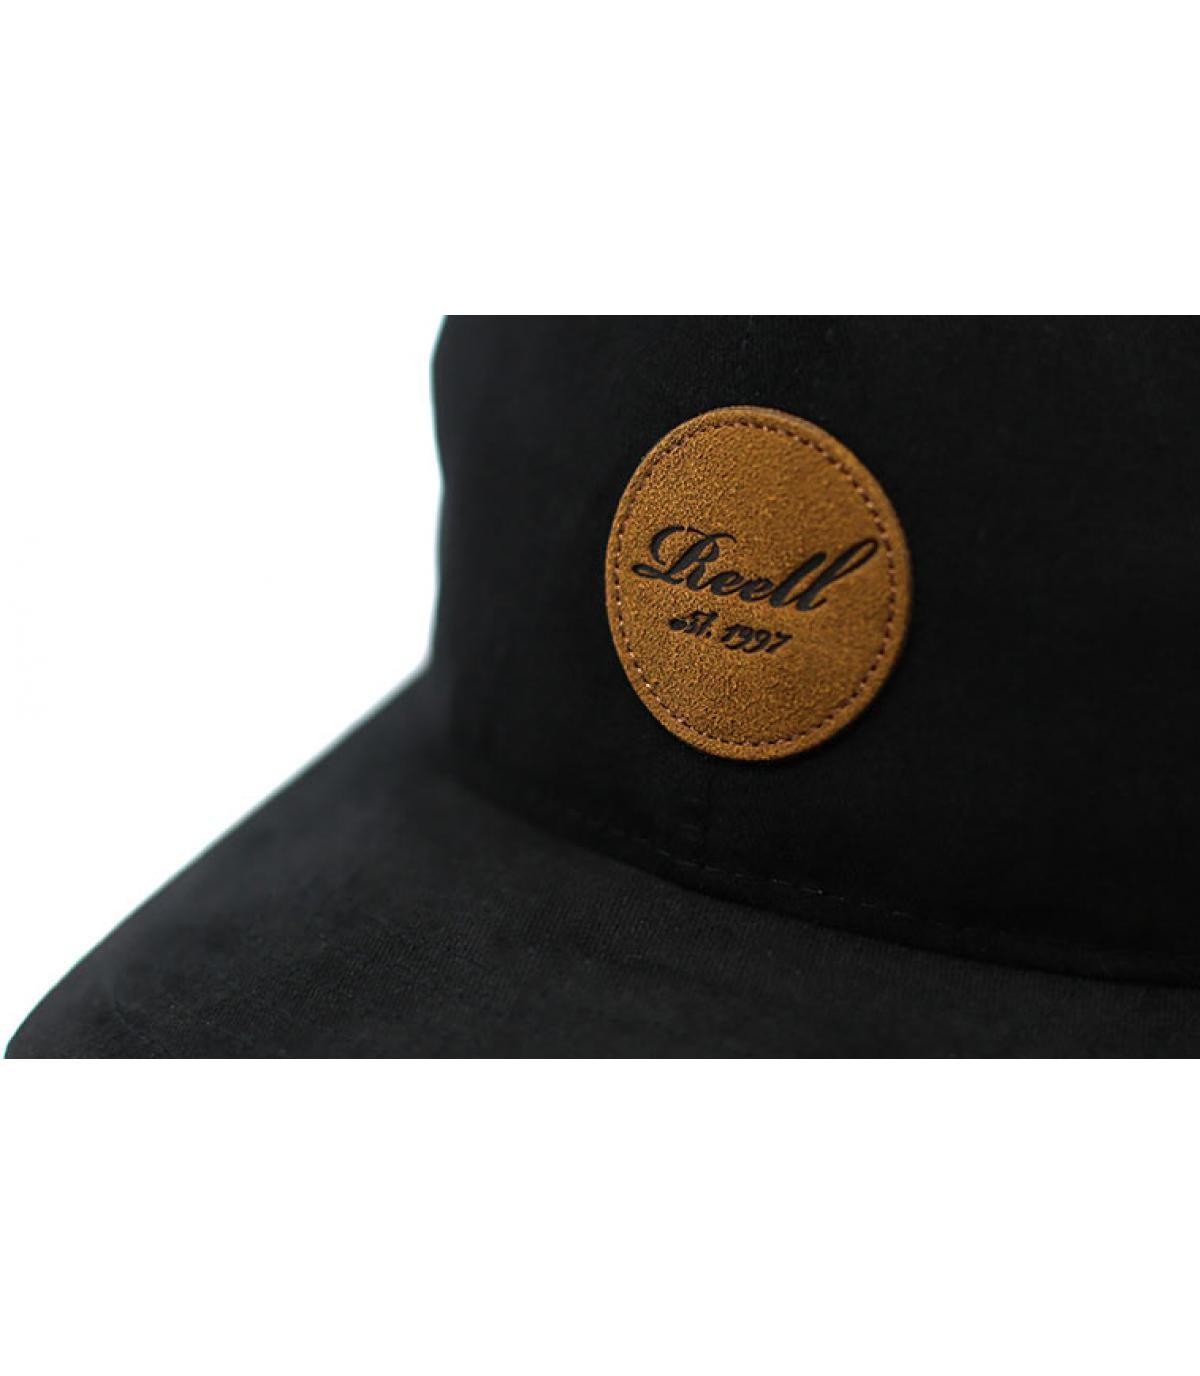 Détails Curved black - image 3